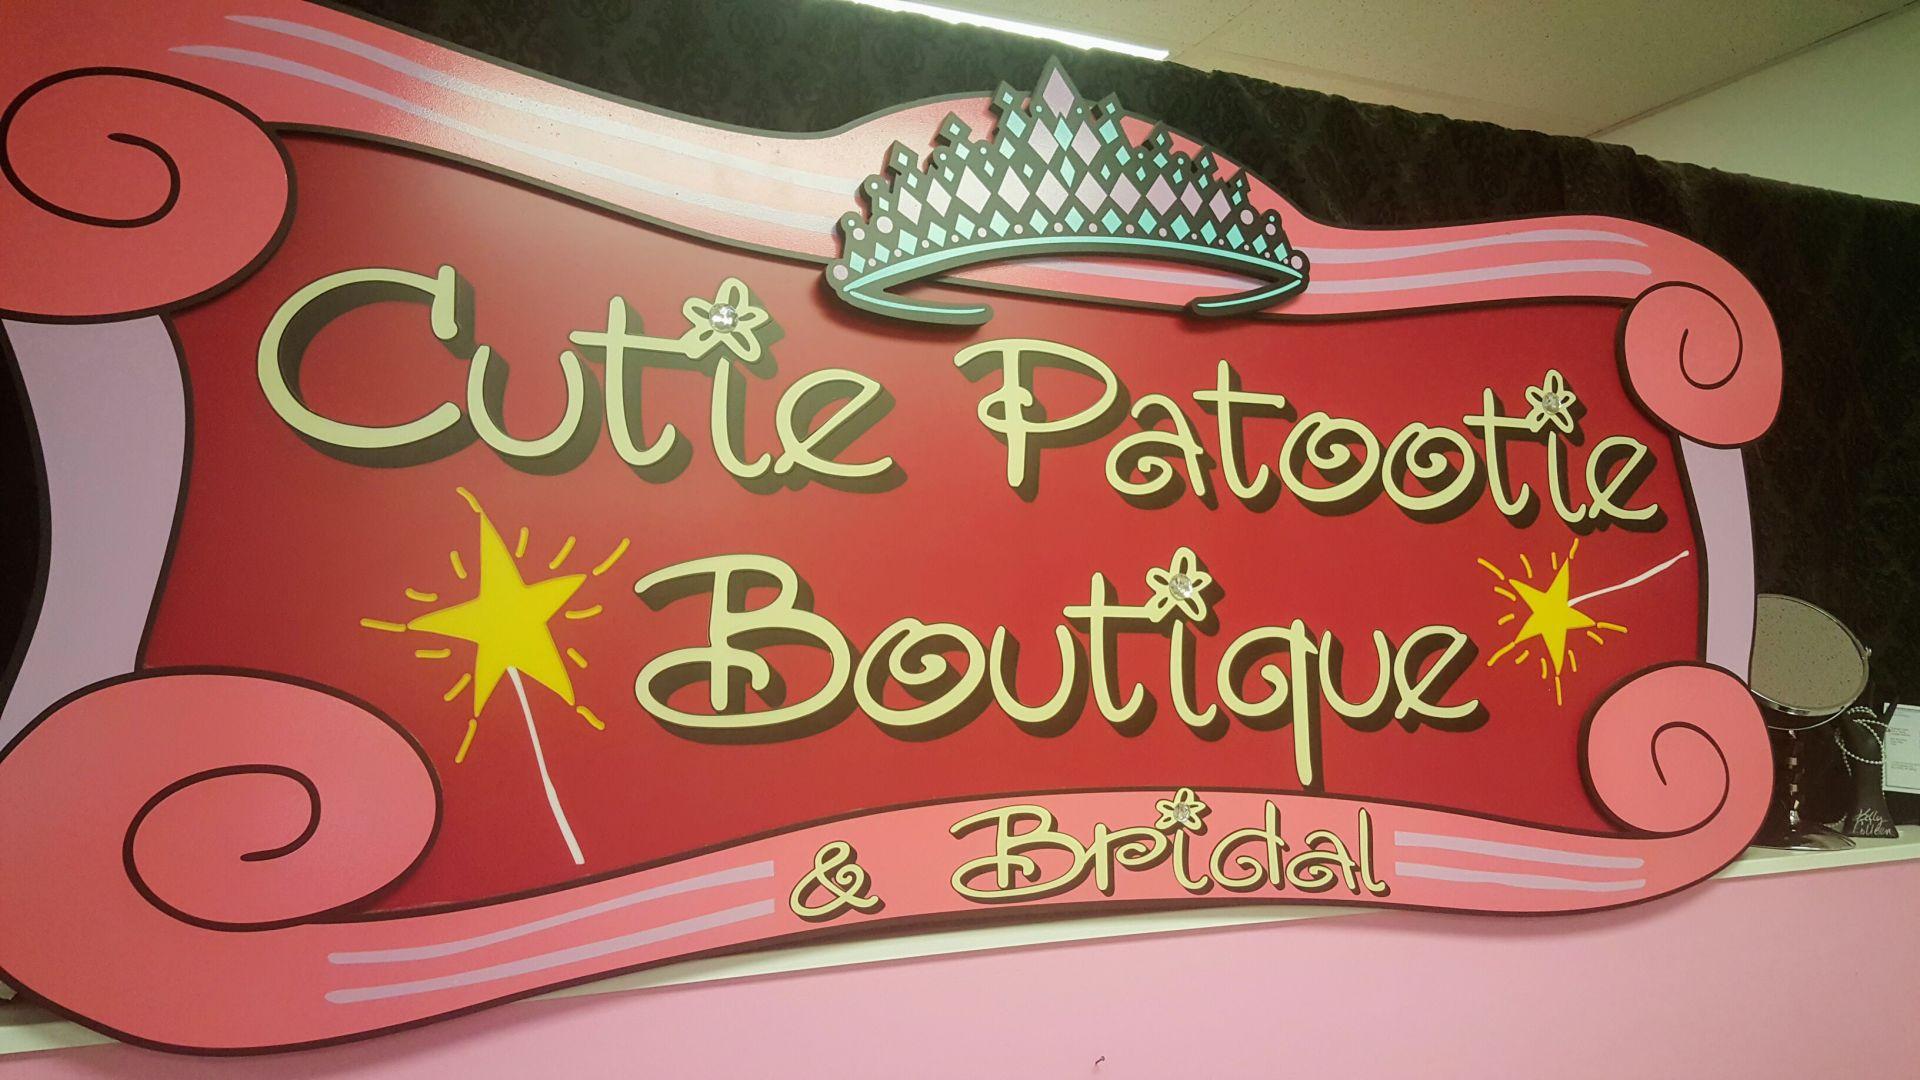 Cutie Patootie Boutique Prom Dresses